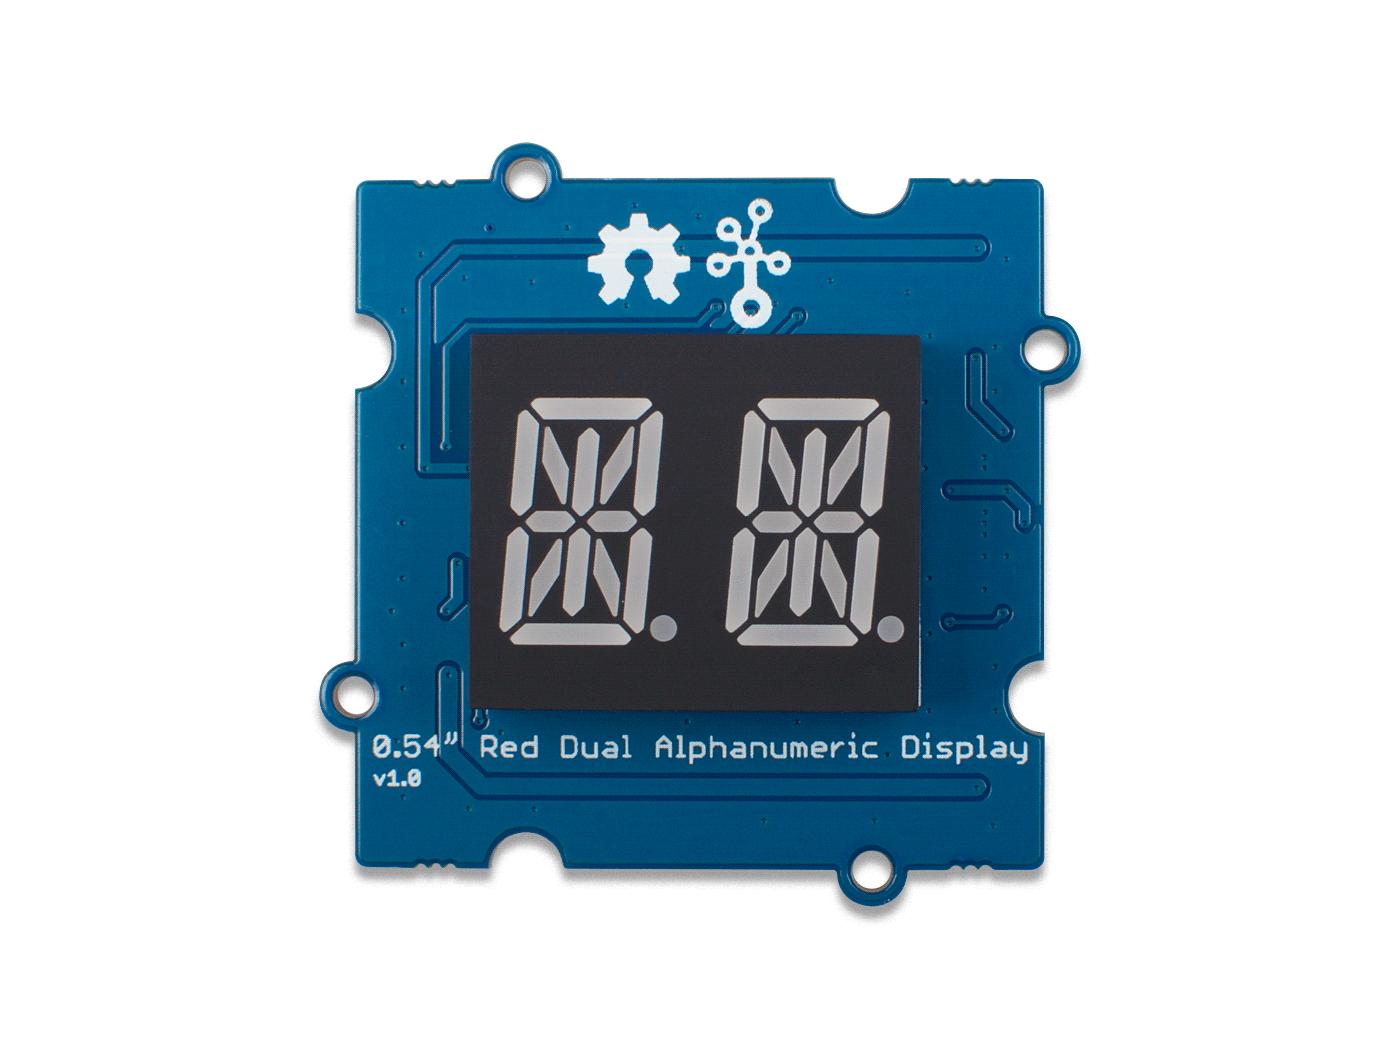 Grove Red Dual Alphanumeric Display